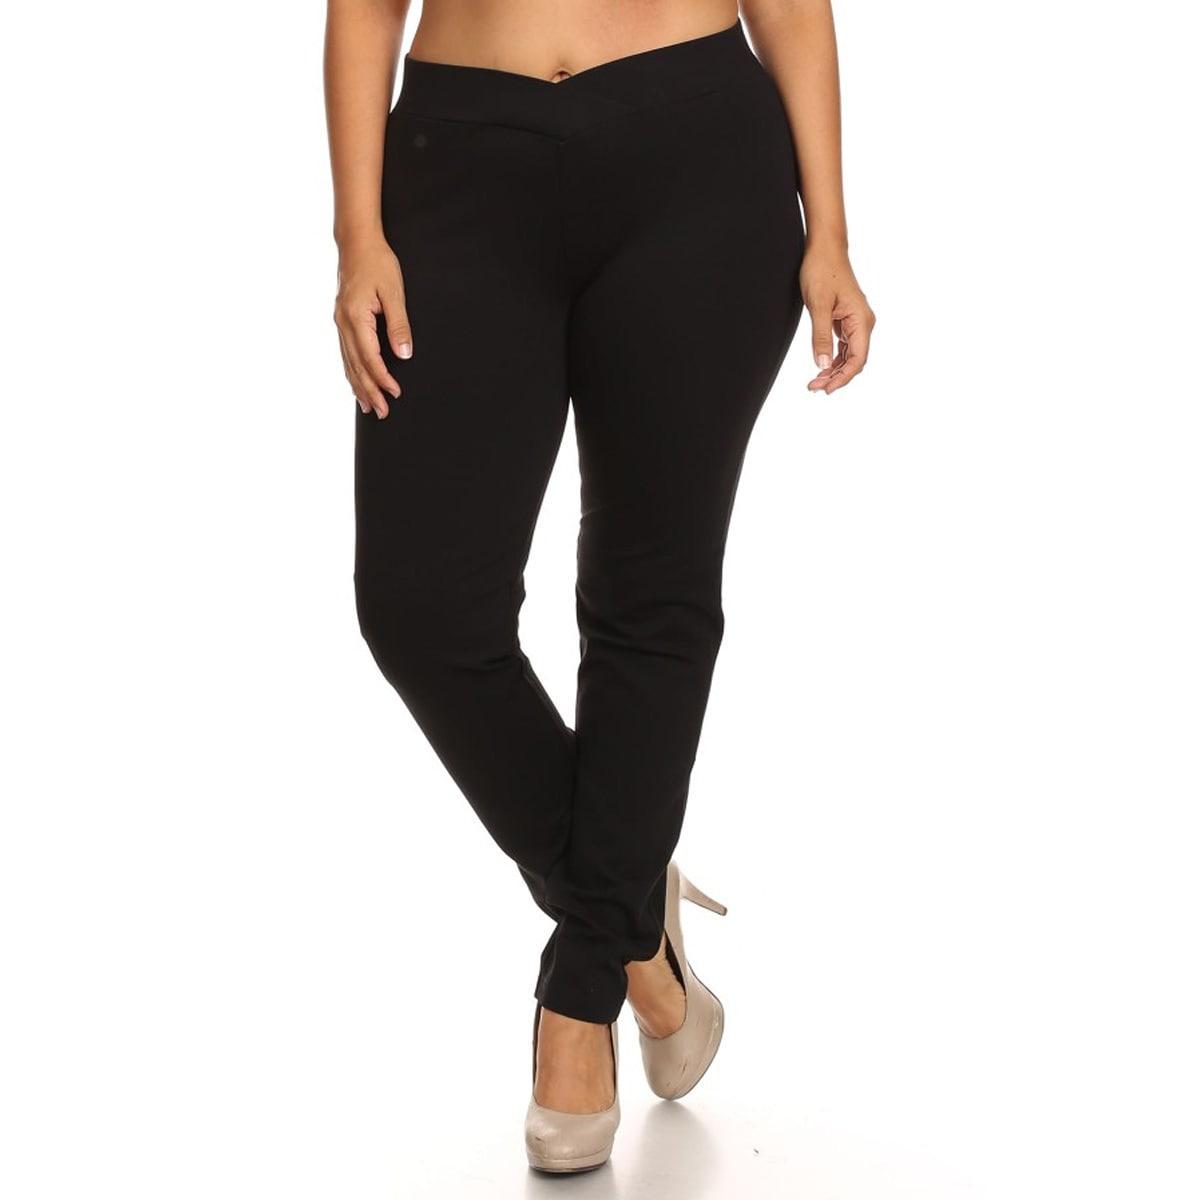 cdb60e56229 Shop Women s Black Rayon Nylon Spandex Plus Size Slim-fit Pants - On Sale -  Free Shipping On Orders Over  45 - Overstock - 13281359 - Khaki - XL